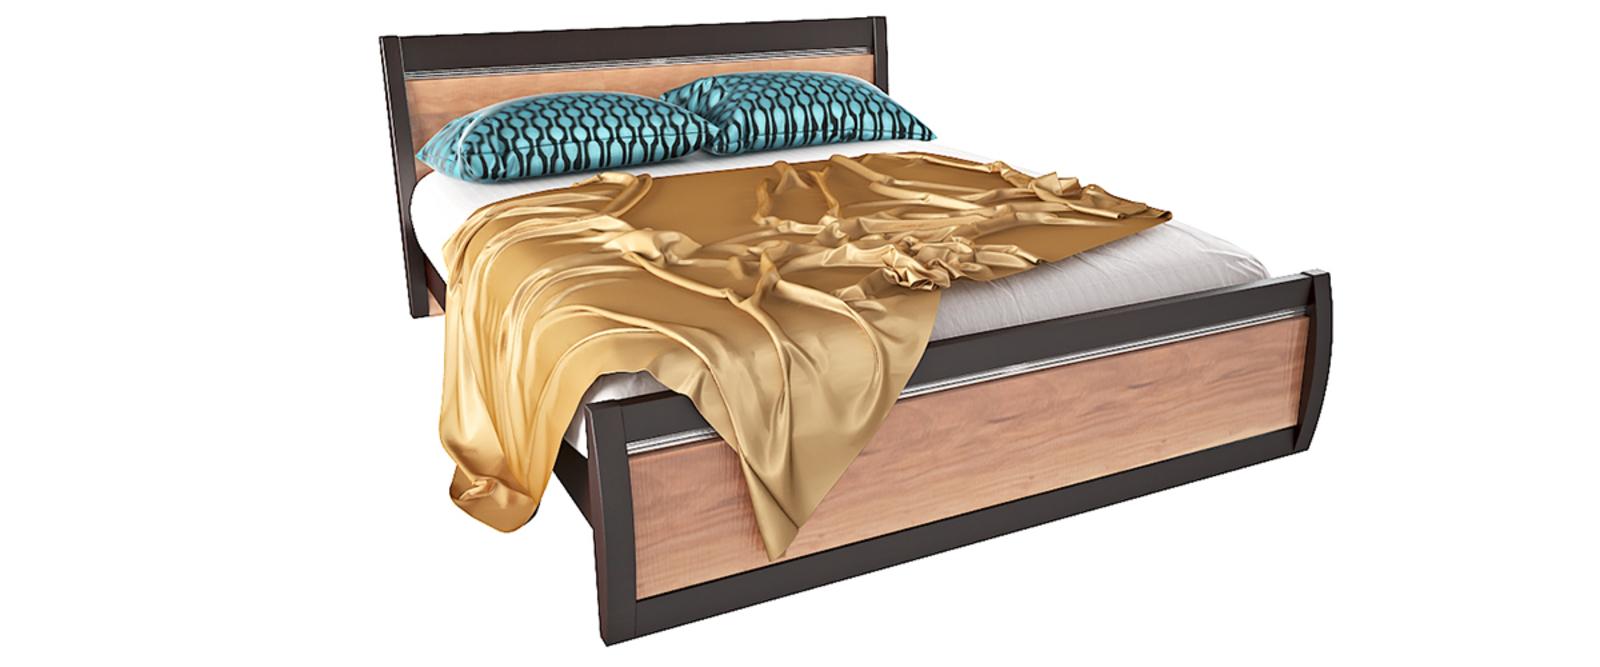 Кровать каркасная Корсика без подъемного механизма (Слива валлис)